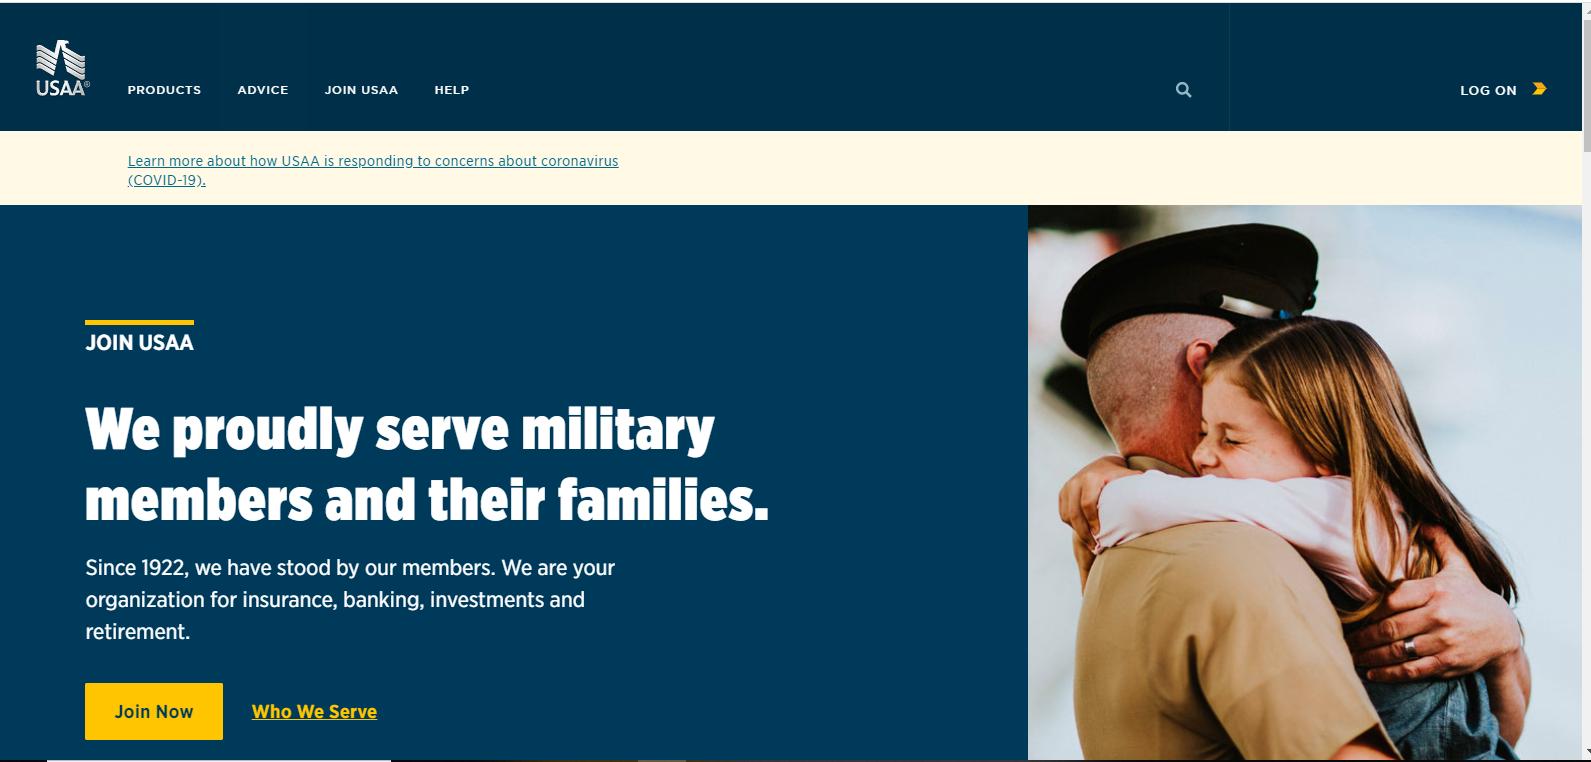 VA Business Loans, Grants And Resources For Veteran Entrepreneurs - Image 5